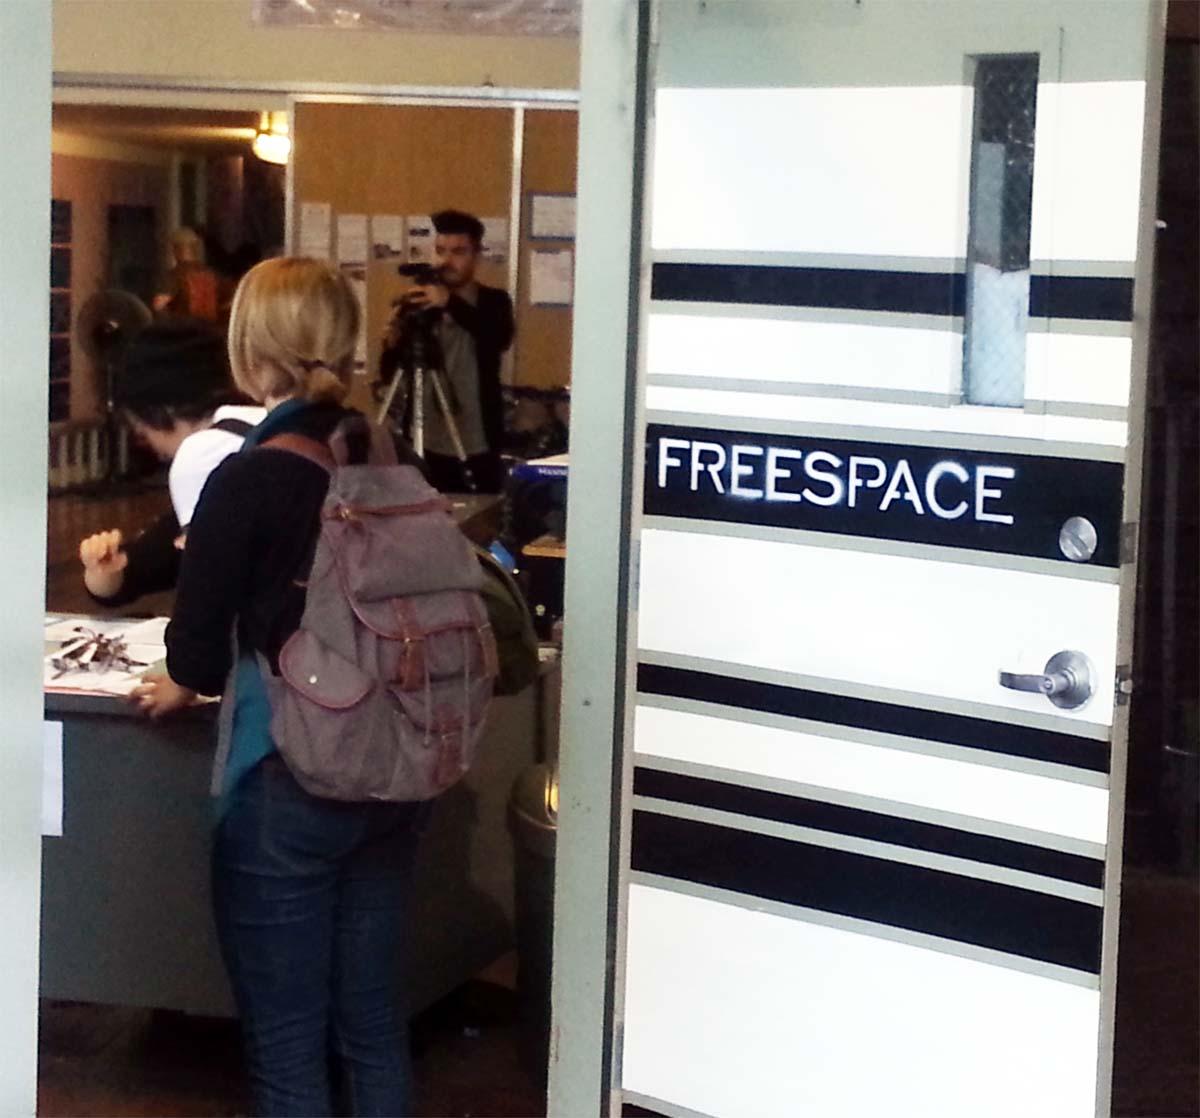 Freespace Welcome